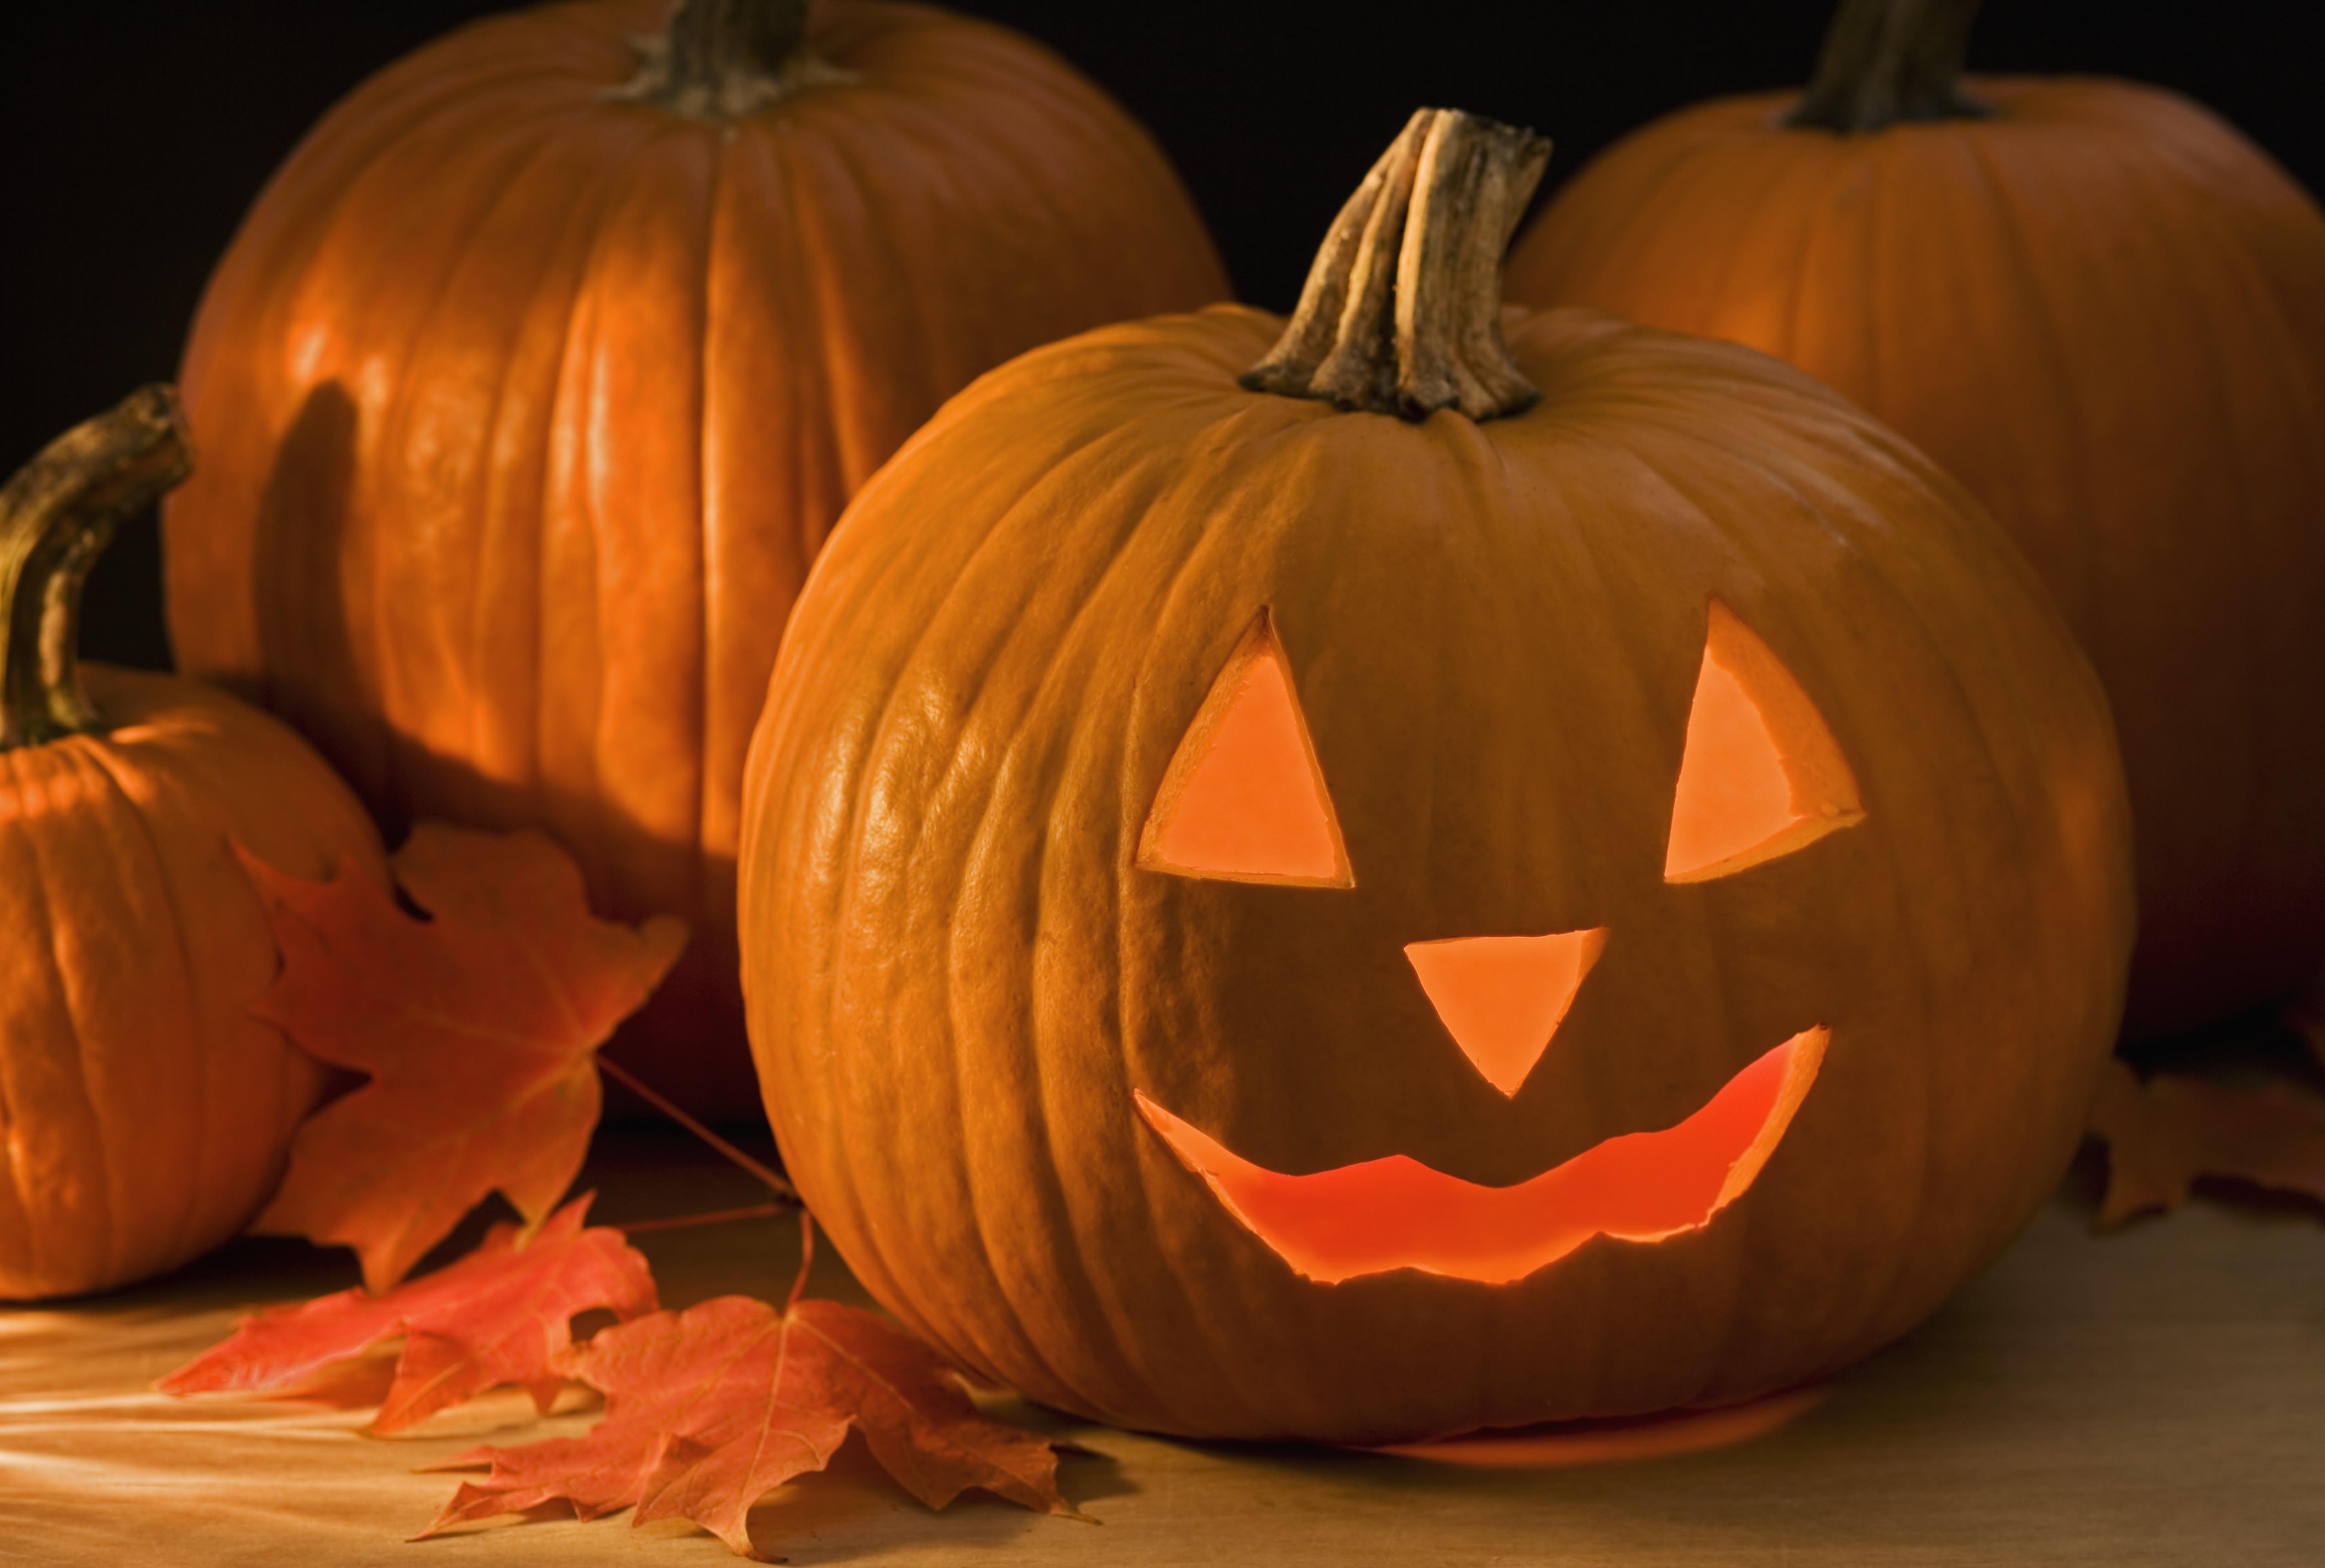 Jack O Lantern Still Life Of A Jack O Lantern 2 Halloween Pictures History Of